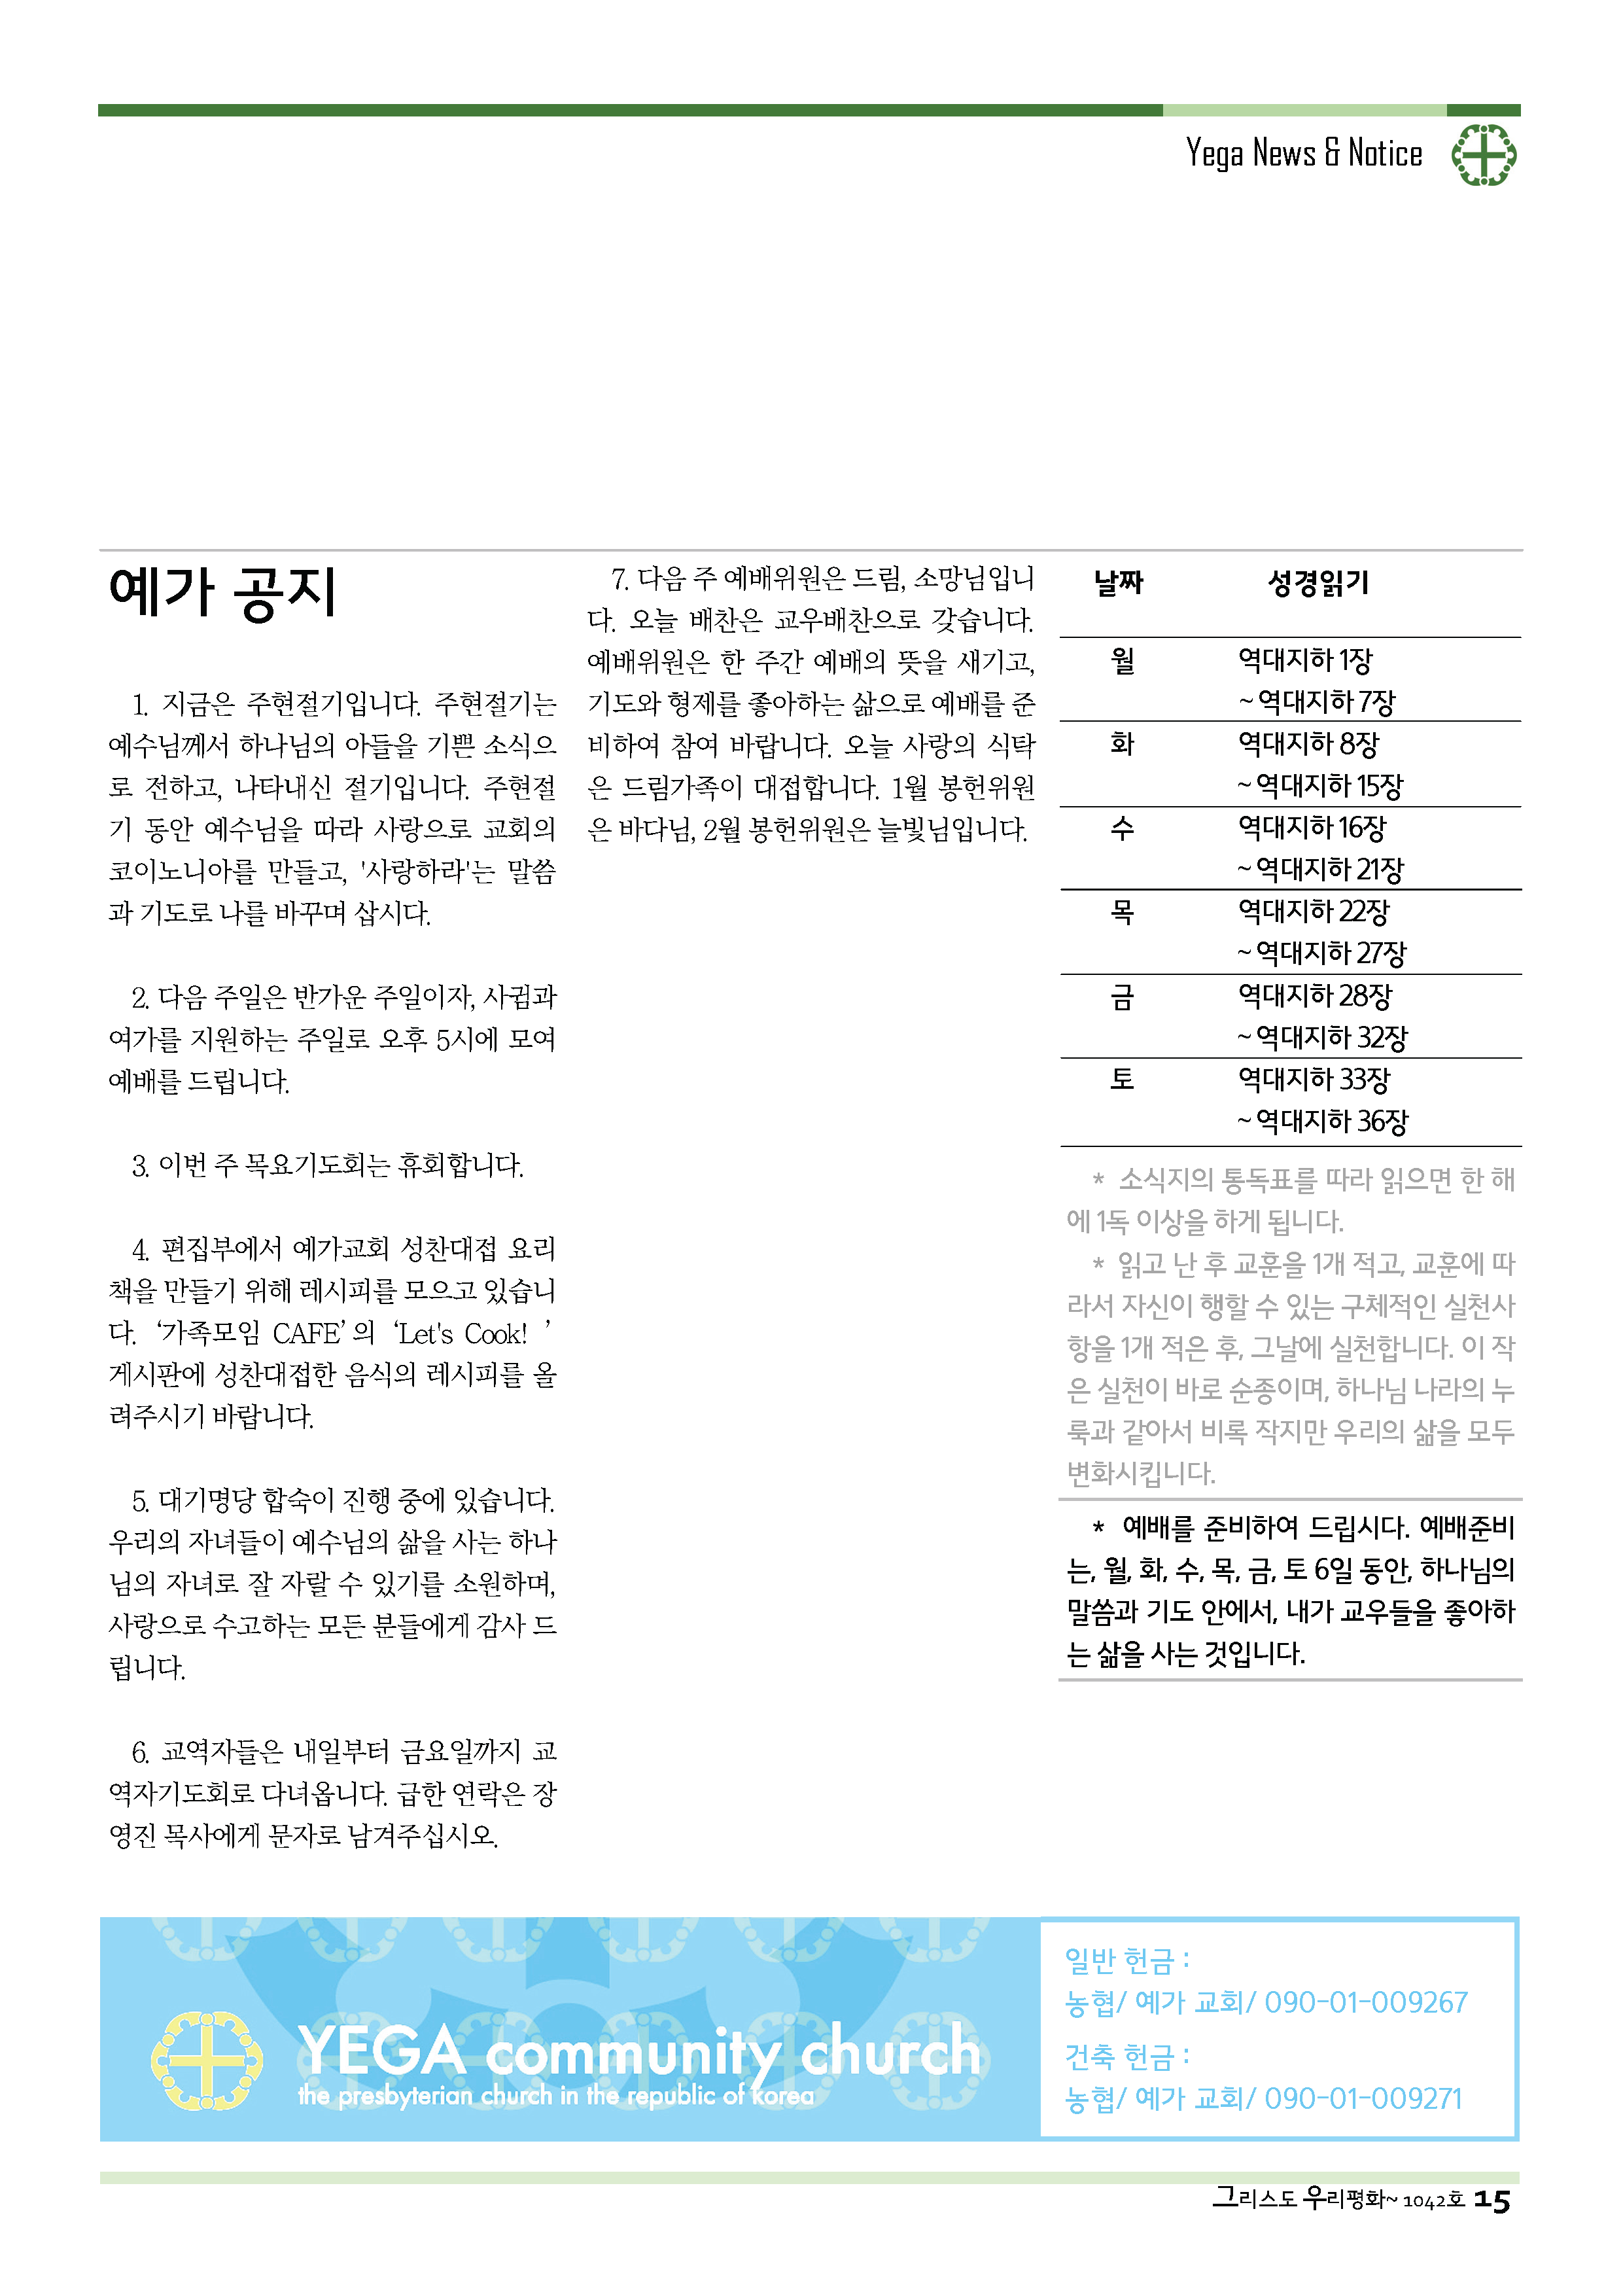 18sdjb0128_페이지_15.png